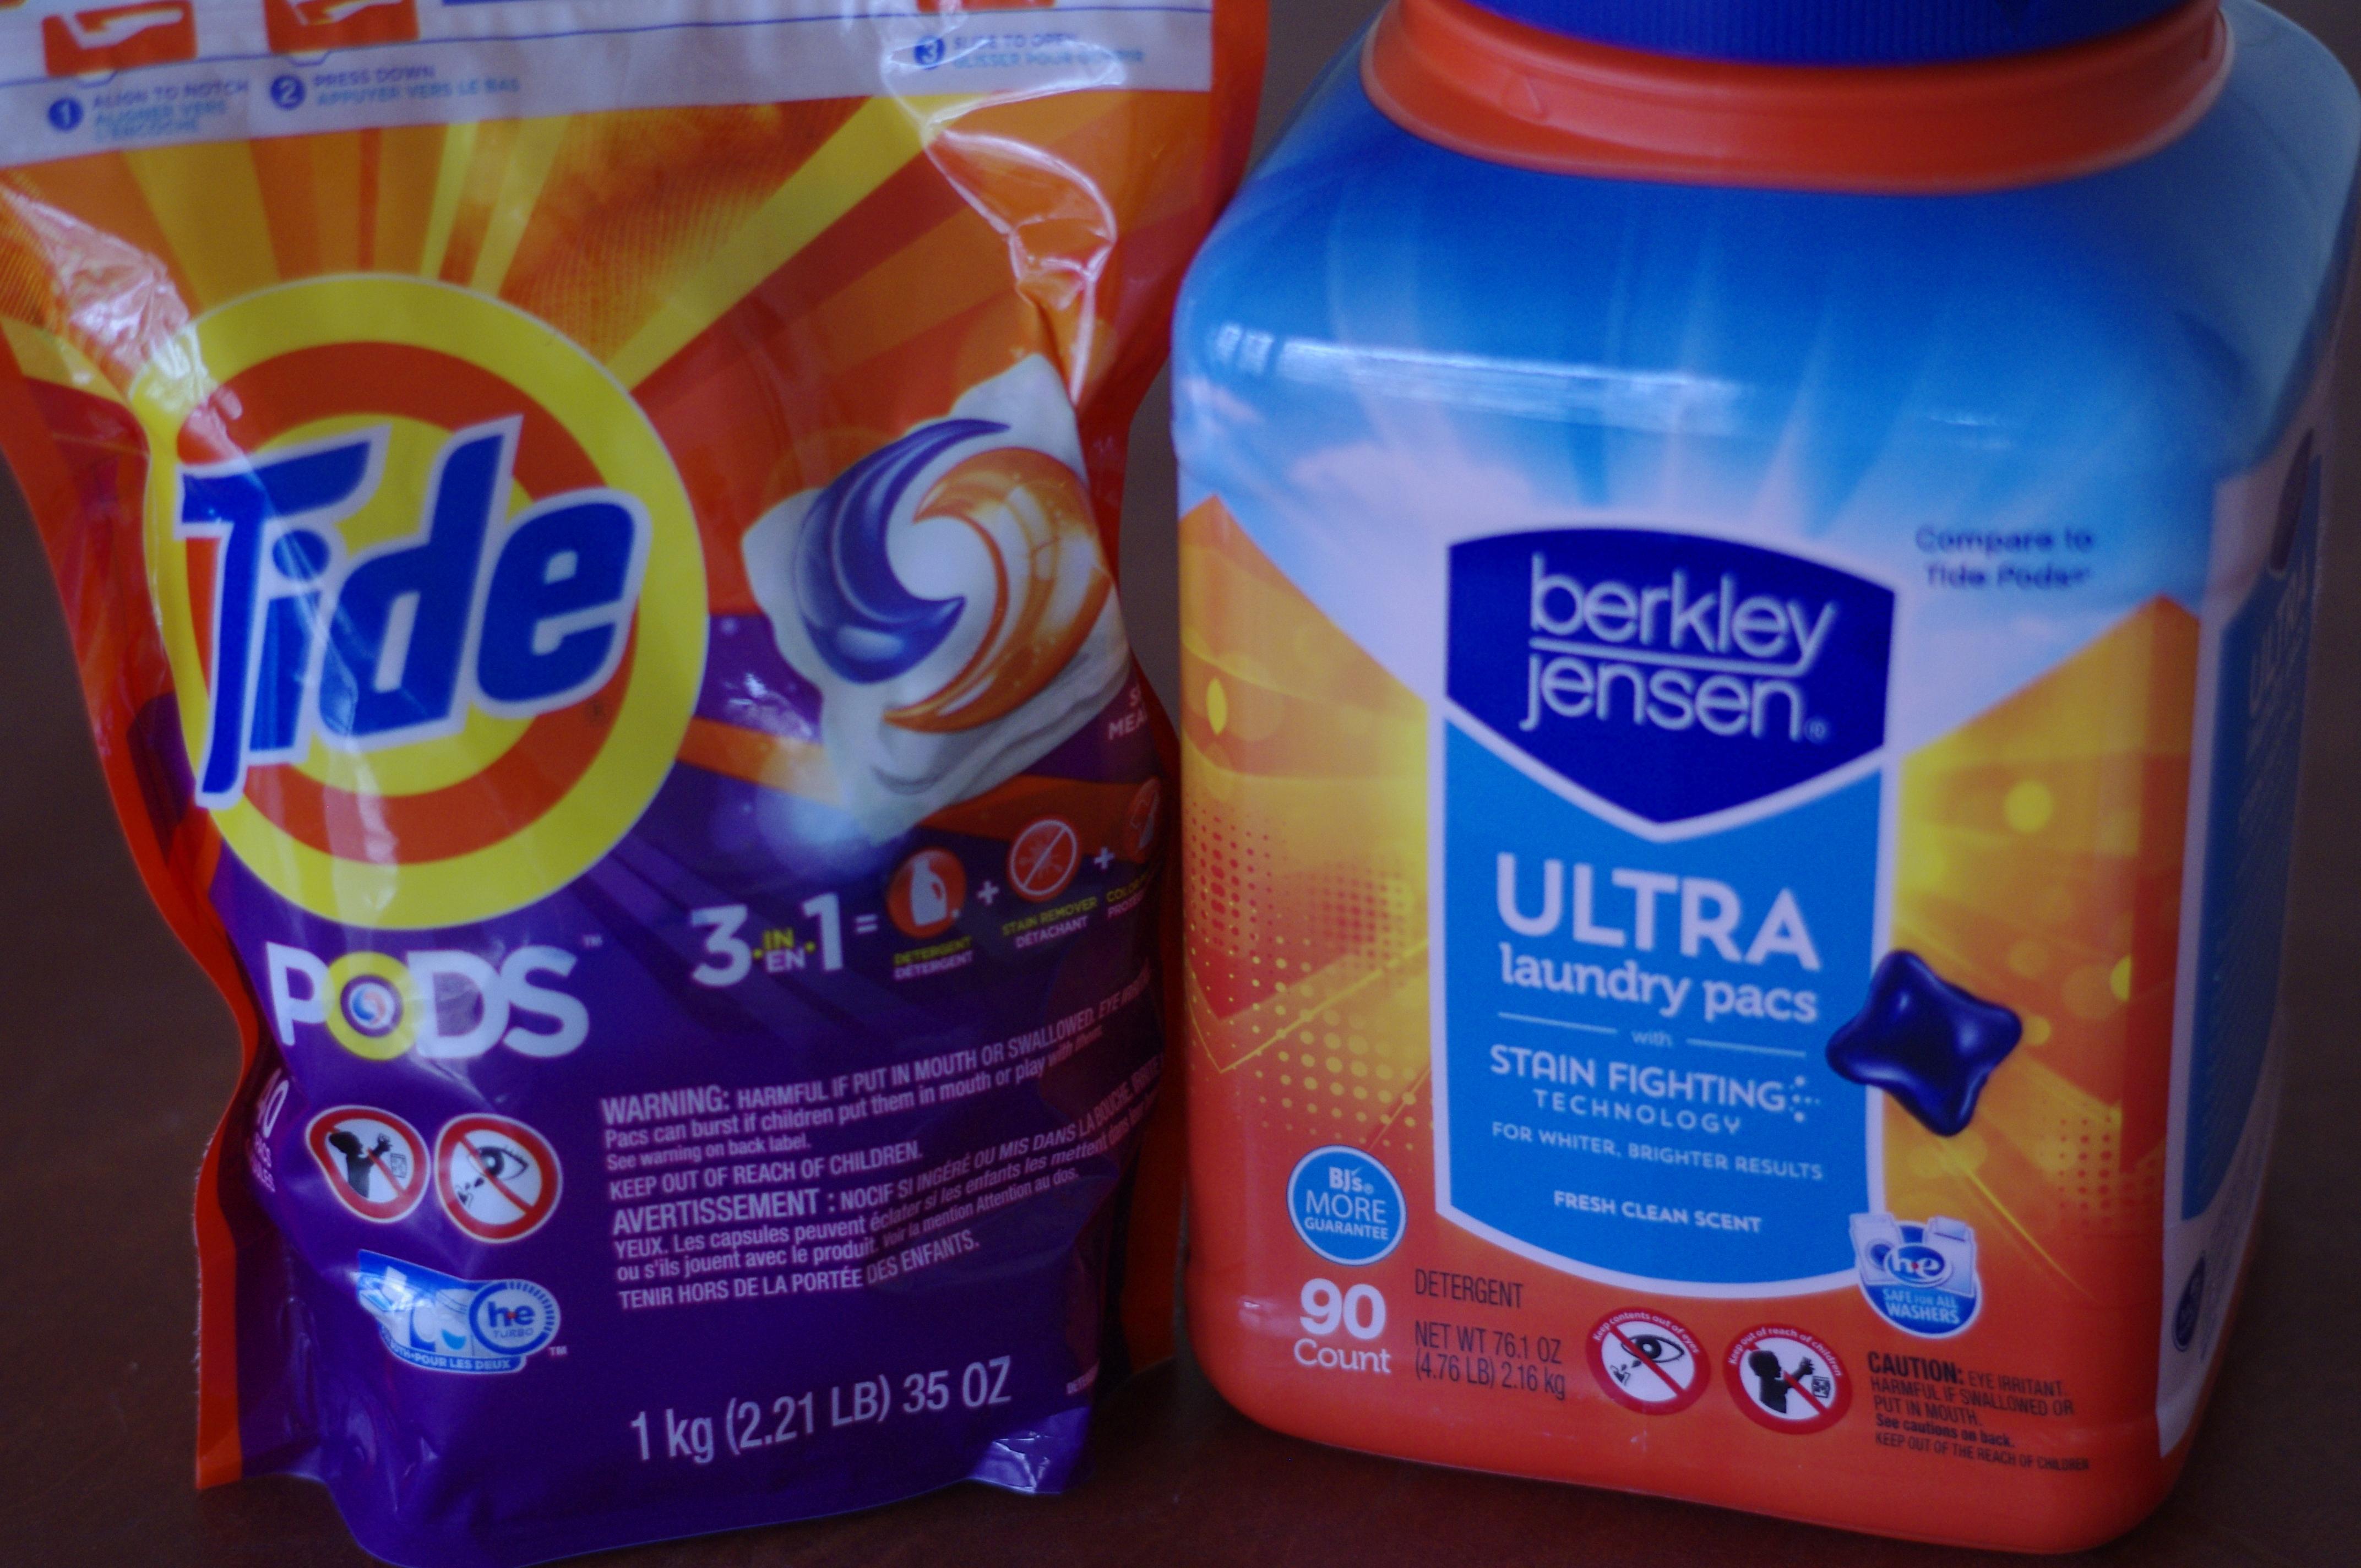 Berkley Jensen Laundry Detergent Video Review On Bj S